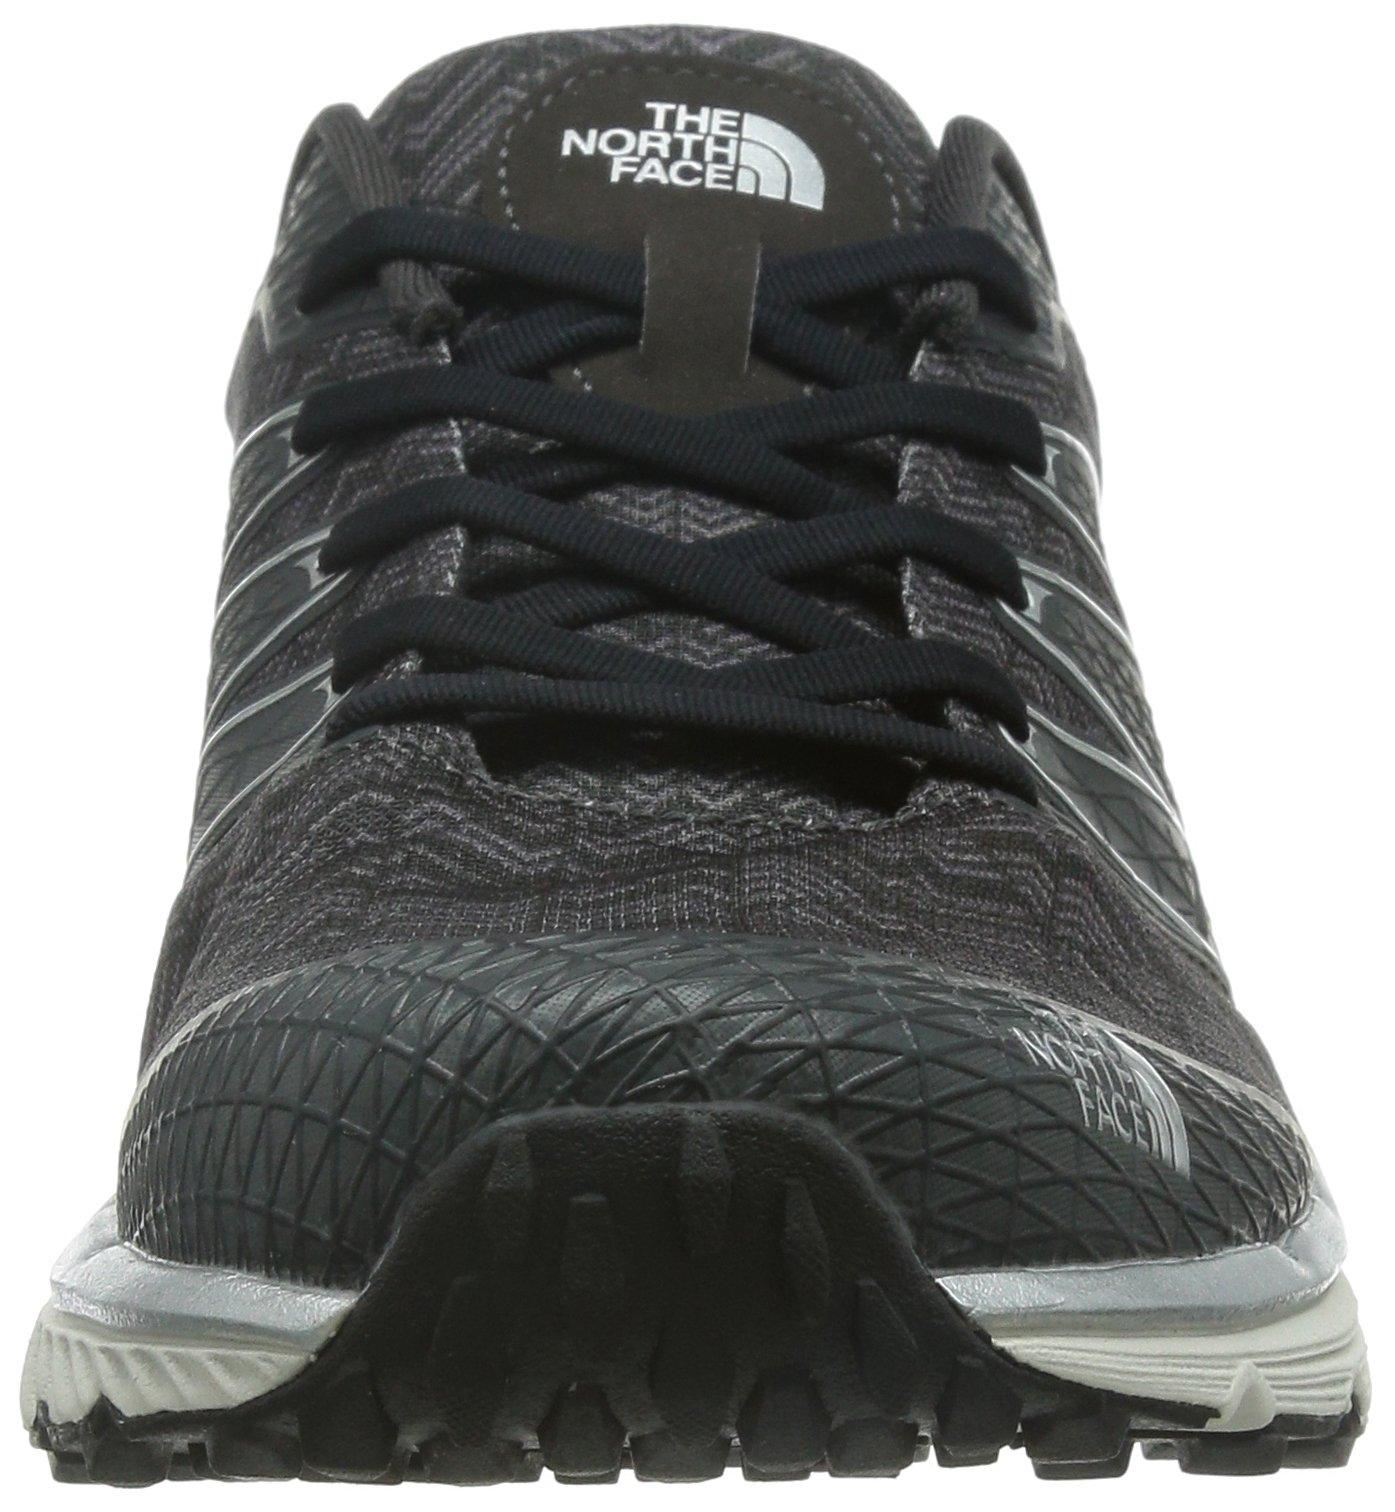 4fb5a763ba84d The North Face Mens Hiking sneakers Litewave TR TNF Black   Grey CXU7TL8